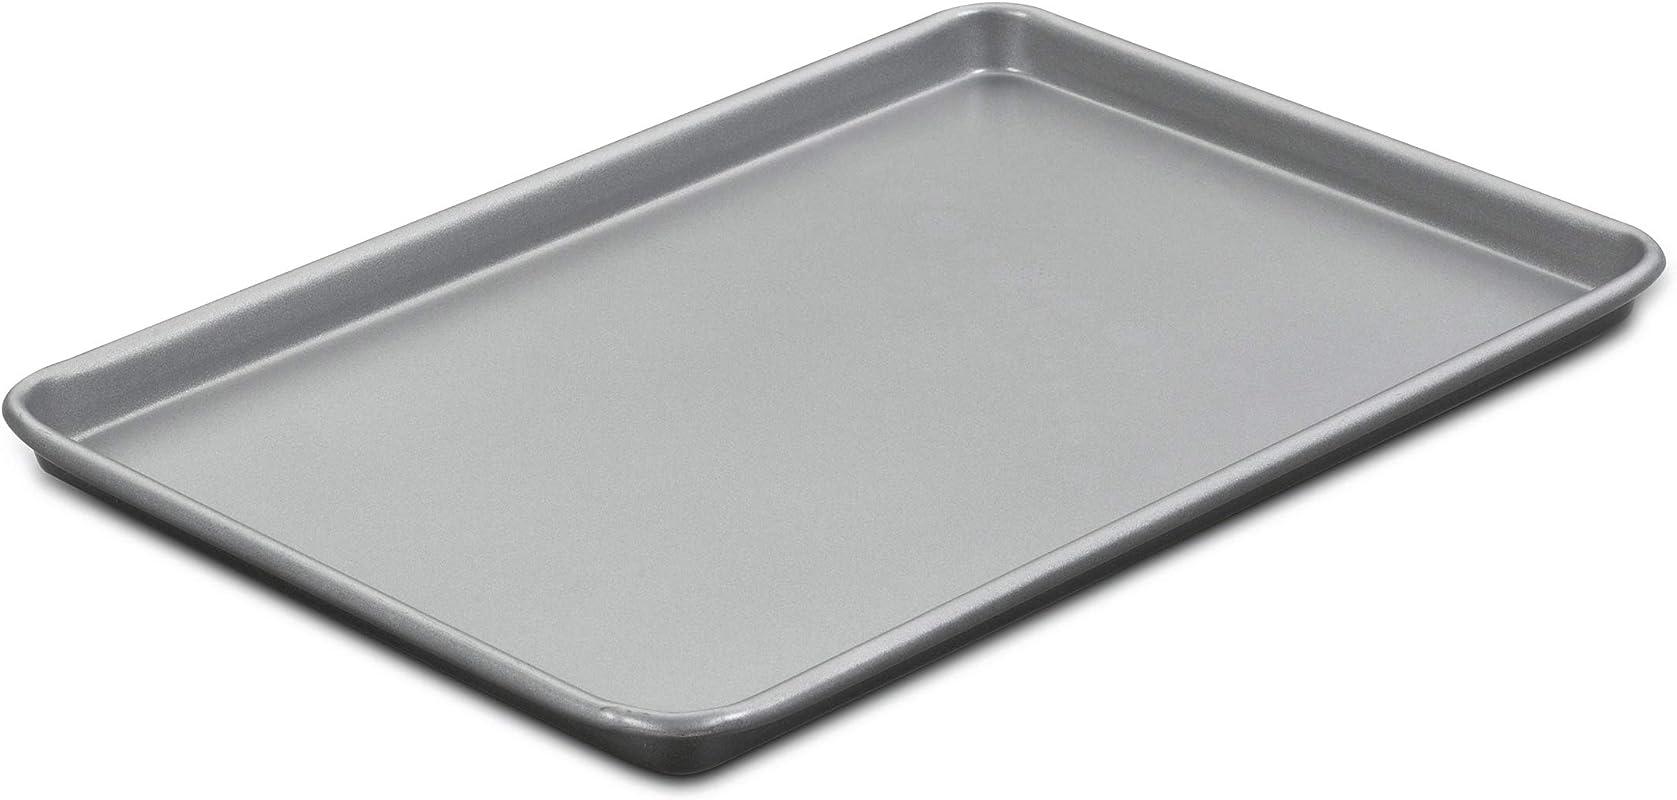 Cuisinart Chef S Classic Nonstick 17 Baking Sheet